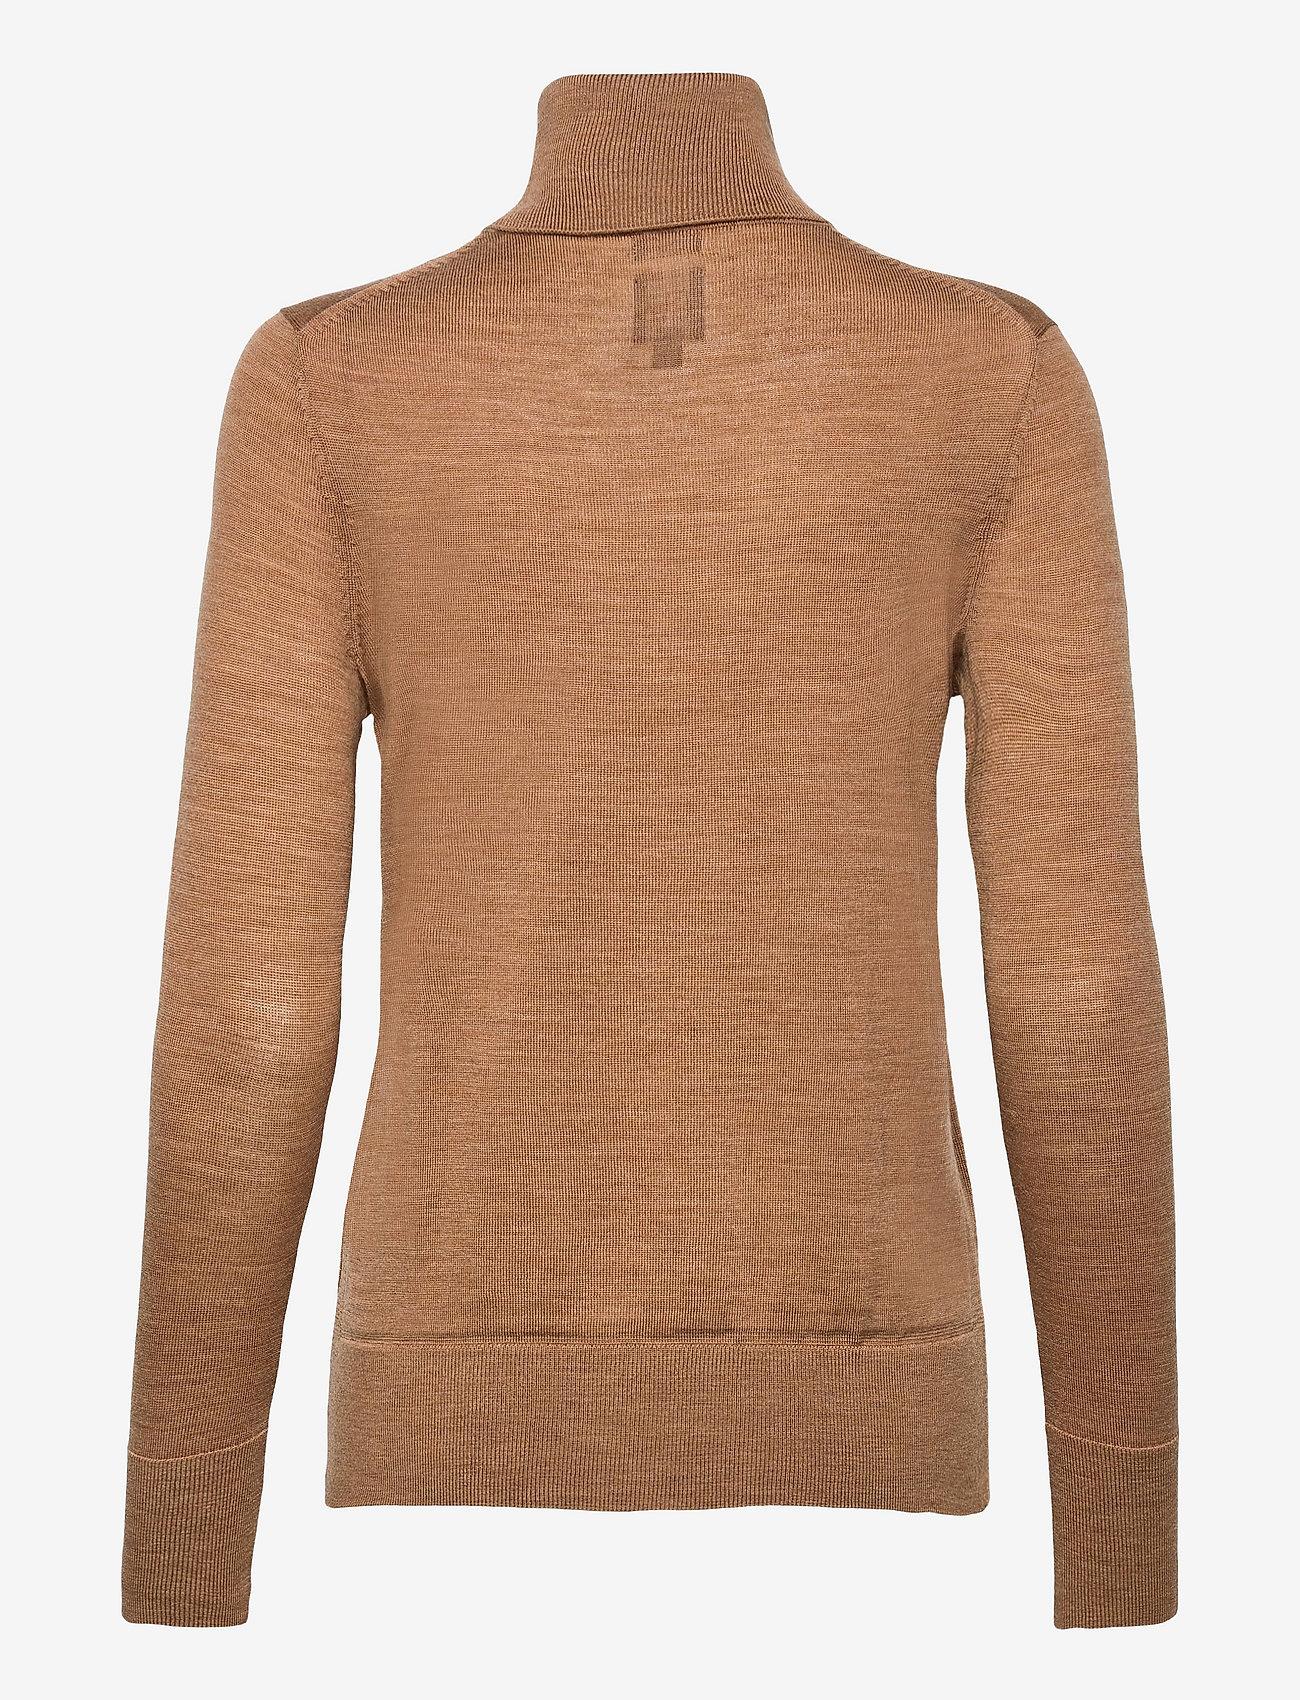 GAP - Merino Turtleneck Sweater - turtlenecks - camel heather b2303 - 1